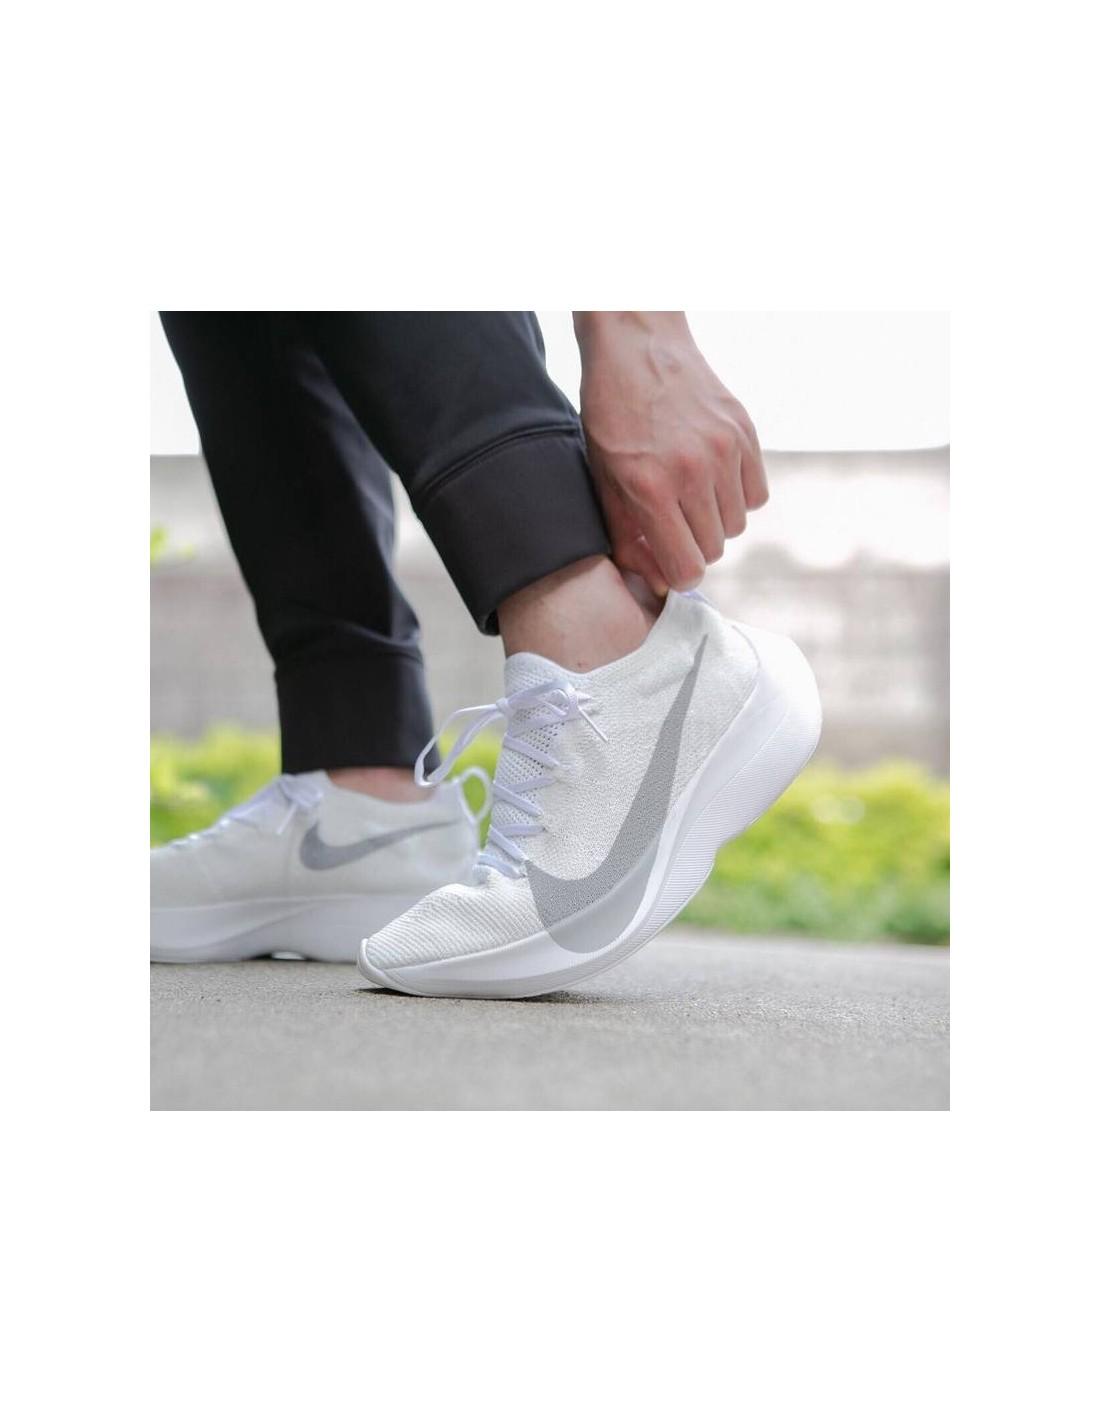 84b9ebd5b8e4 Accueil · React Vapor Street Flyknit. Previous. Next. Previous. Next. Nike